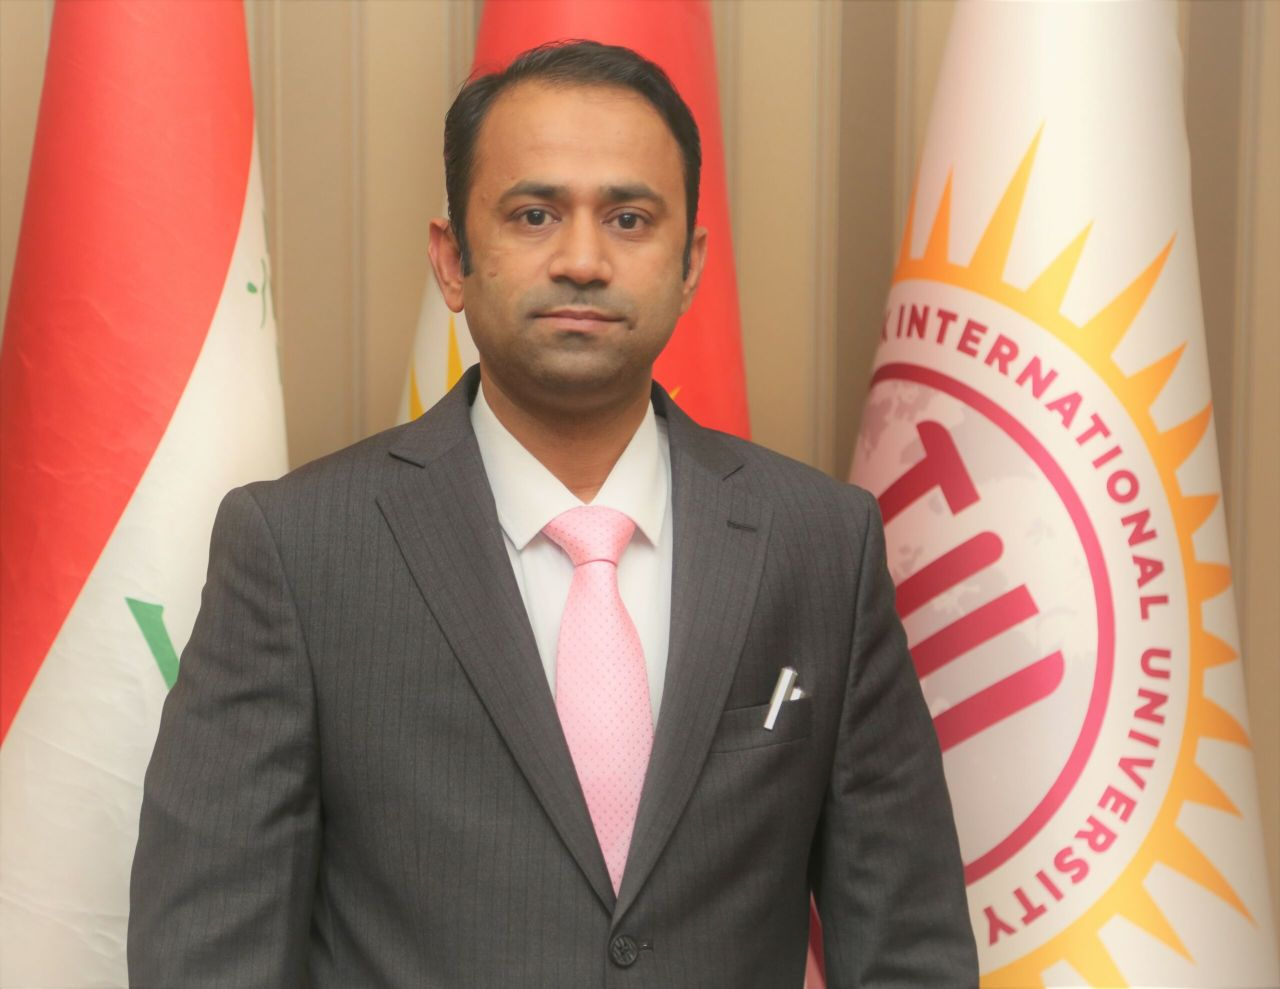 Dr. Abdul Samad